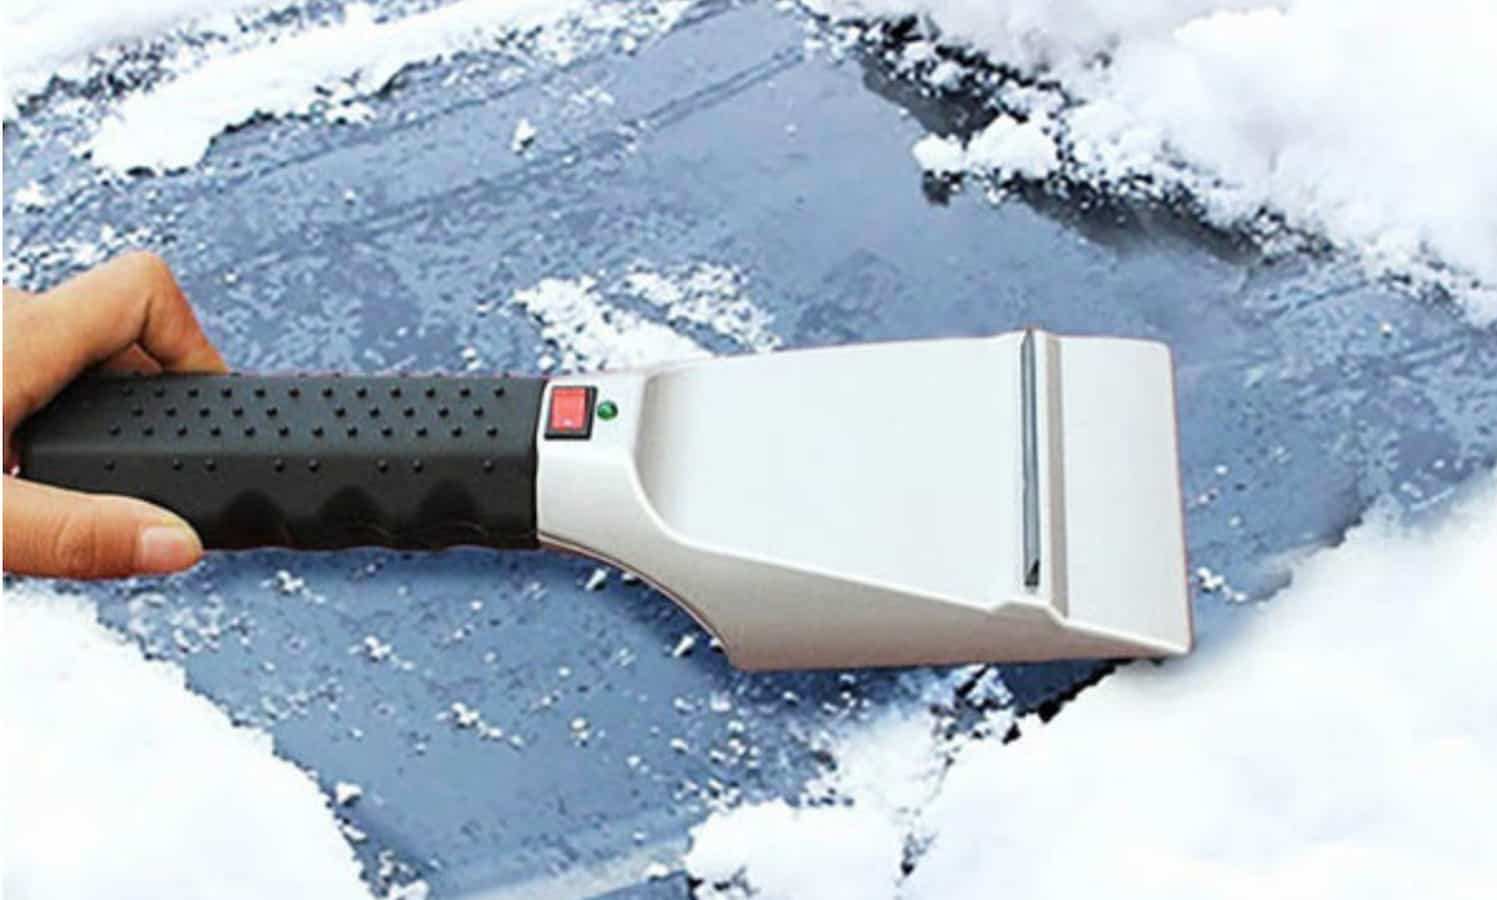 portable heated ice scraper